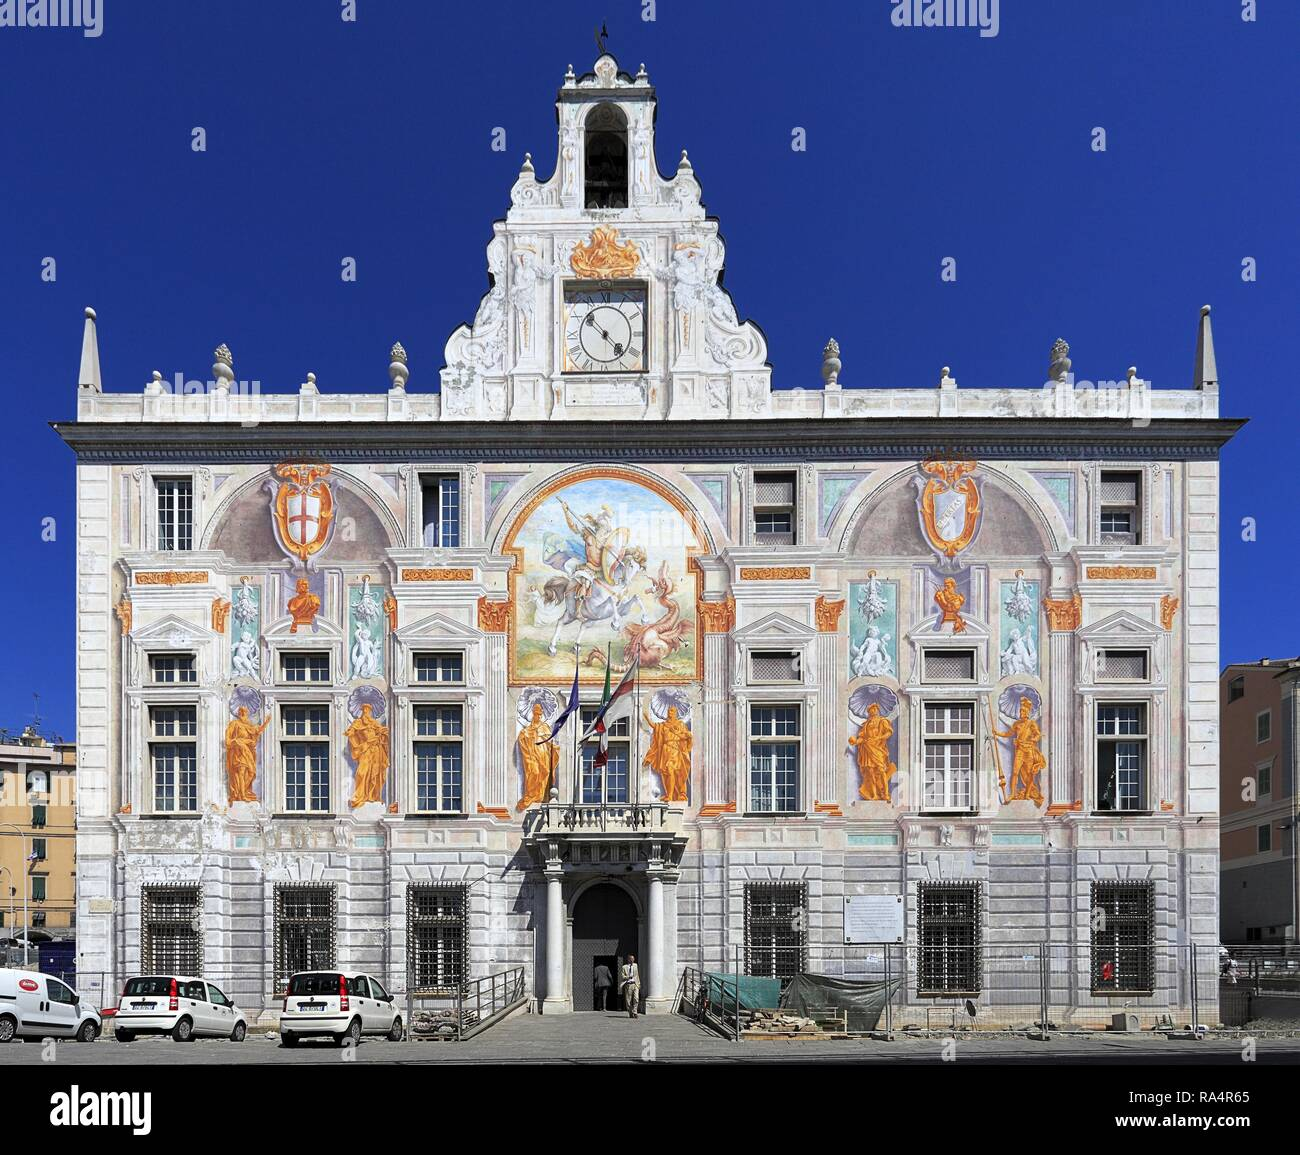 Wlochy - Liguria - Genua - Palac sw. Jerzego - Palazzo San Giorgio przy placu Piazza Caricamento Italy - Liguria - Genoa -  Saint George Palace by the Piazza Caricamento square - Stock Image